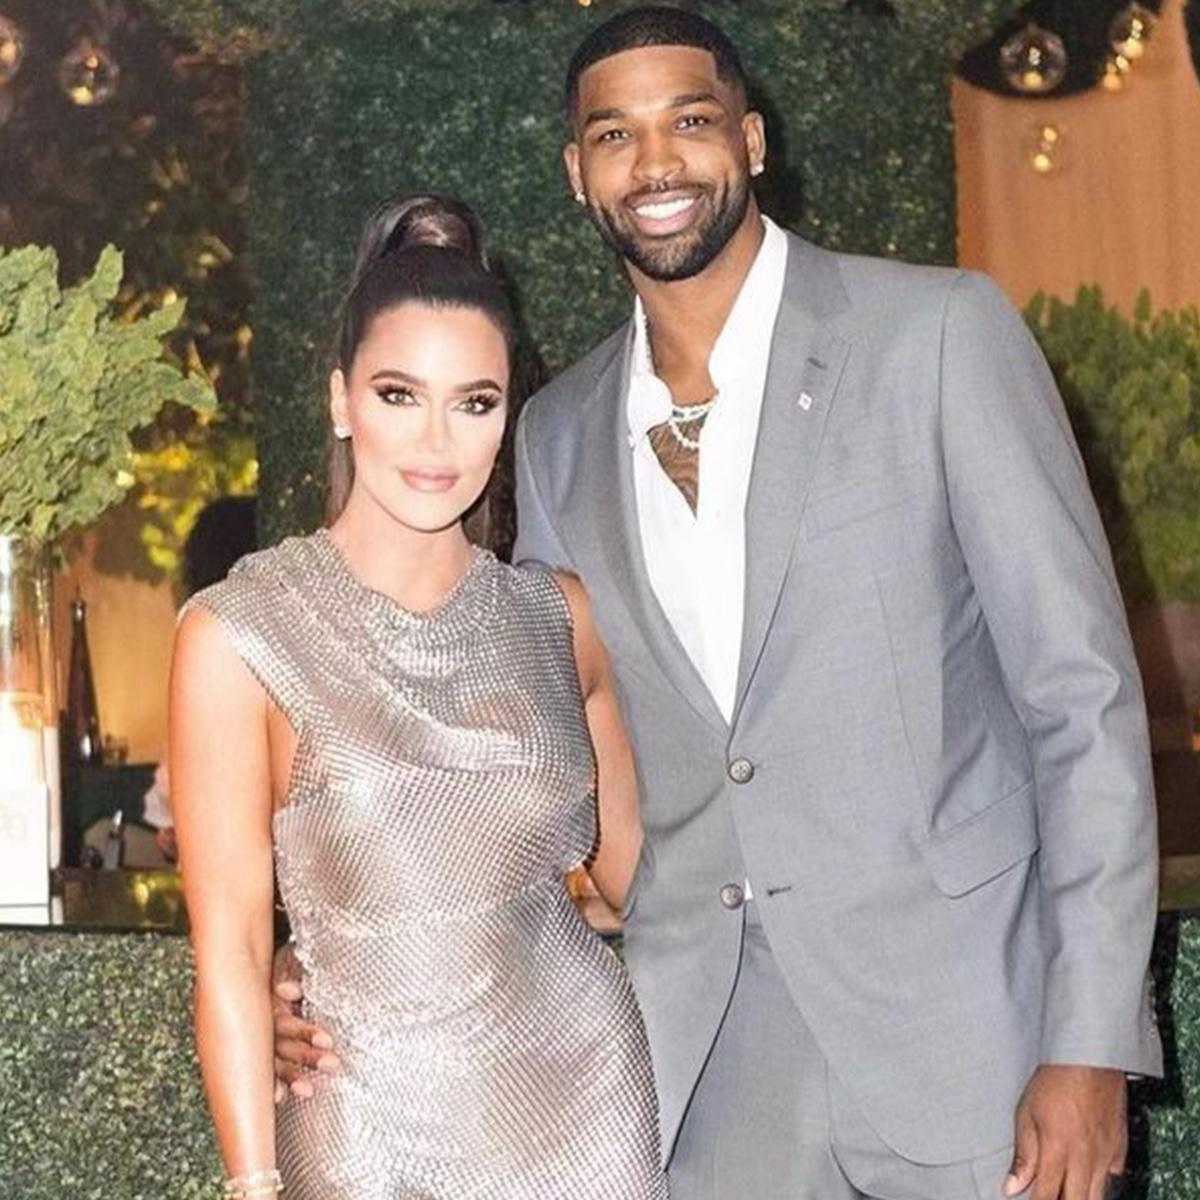 Khloe Kardashian and Tristan Thompson Split Again After Reconciliation - E!  Online - AP